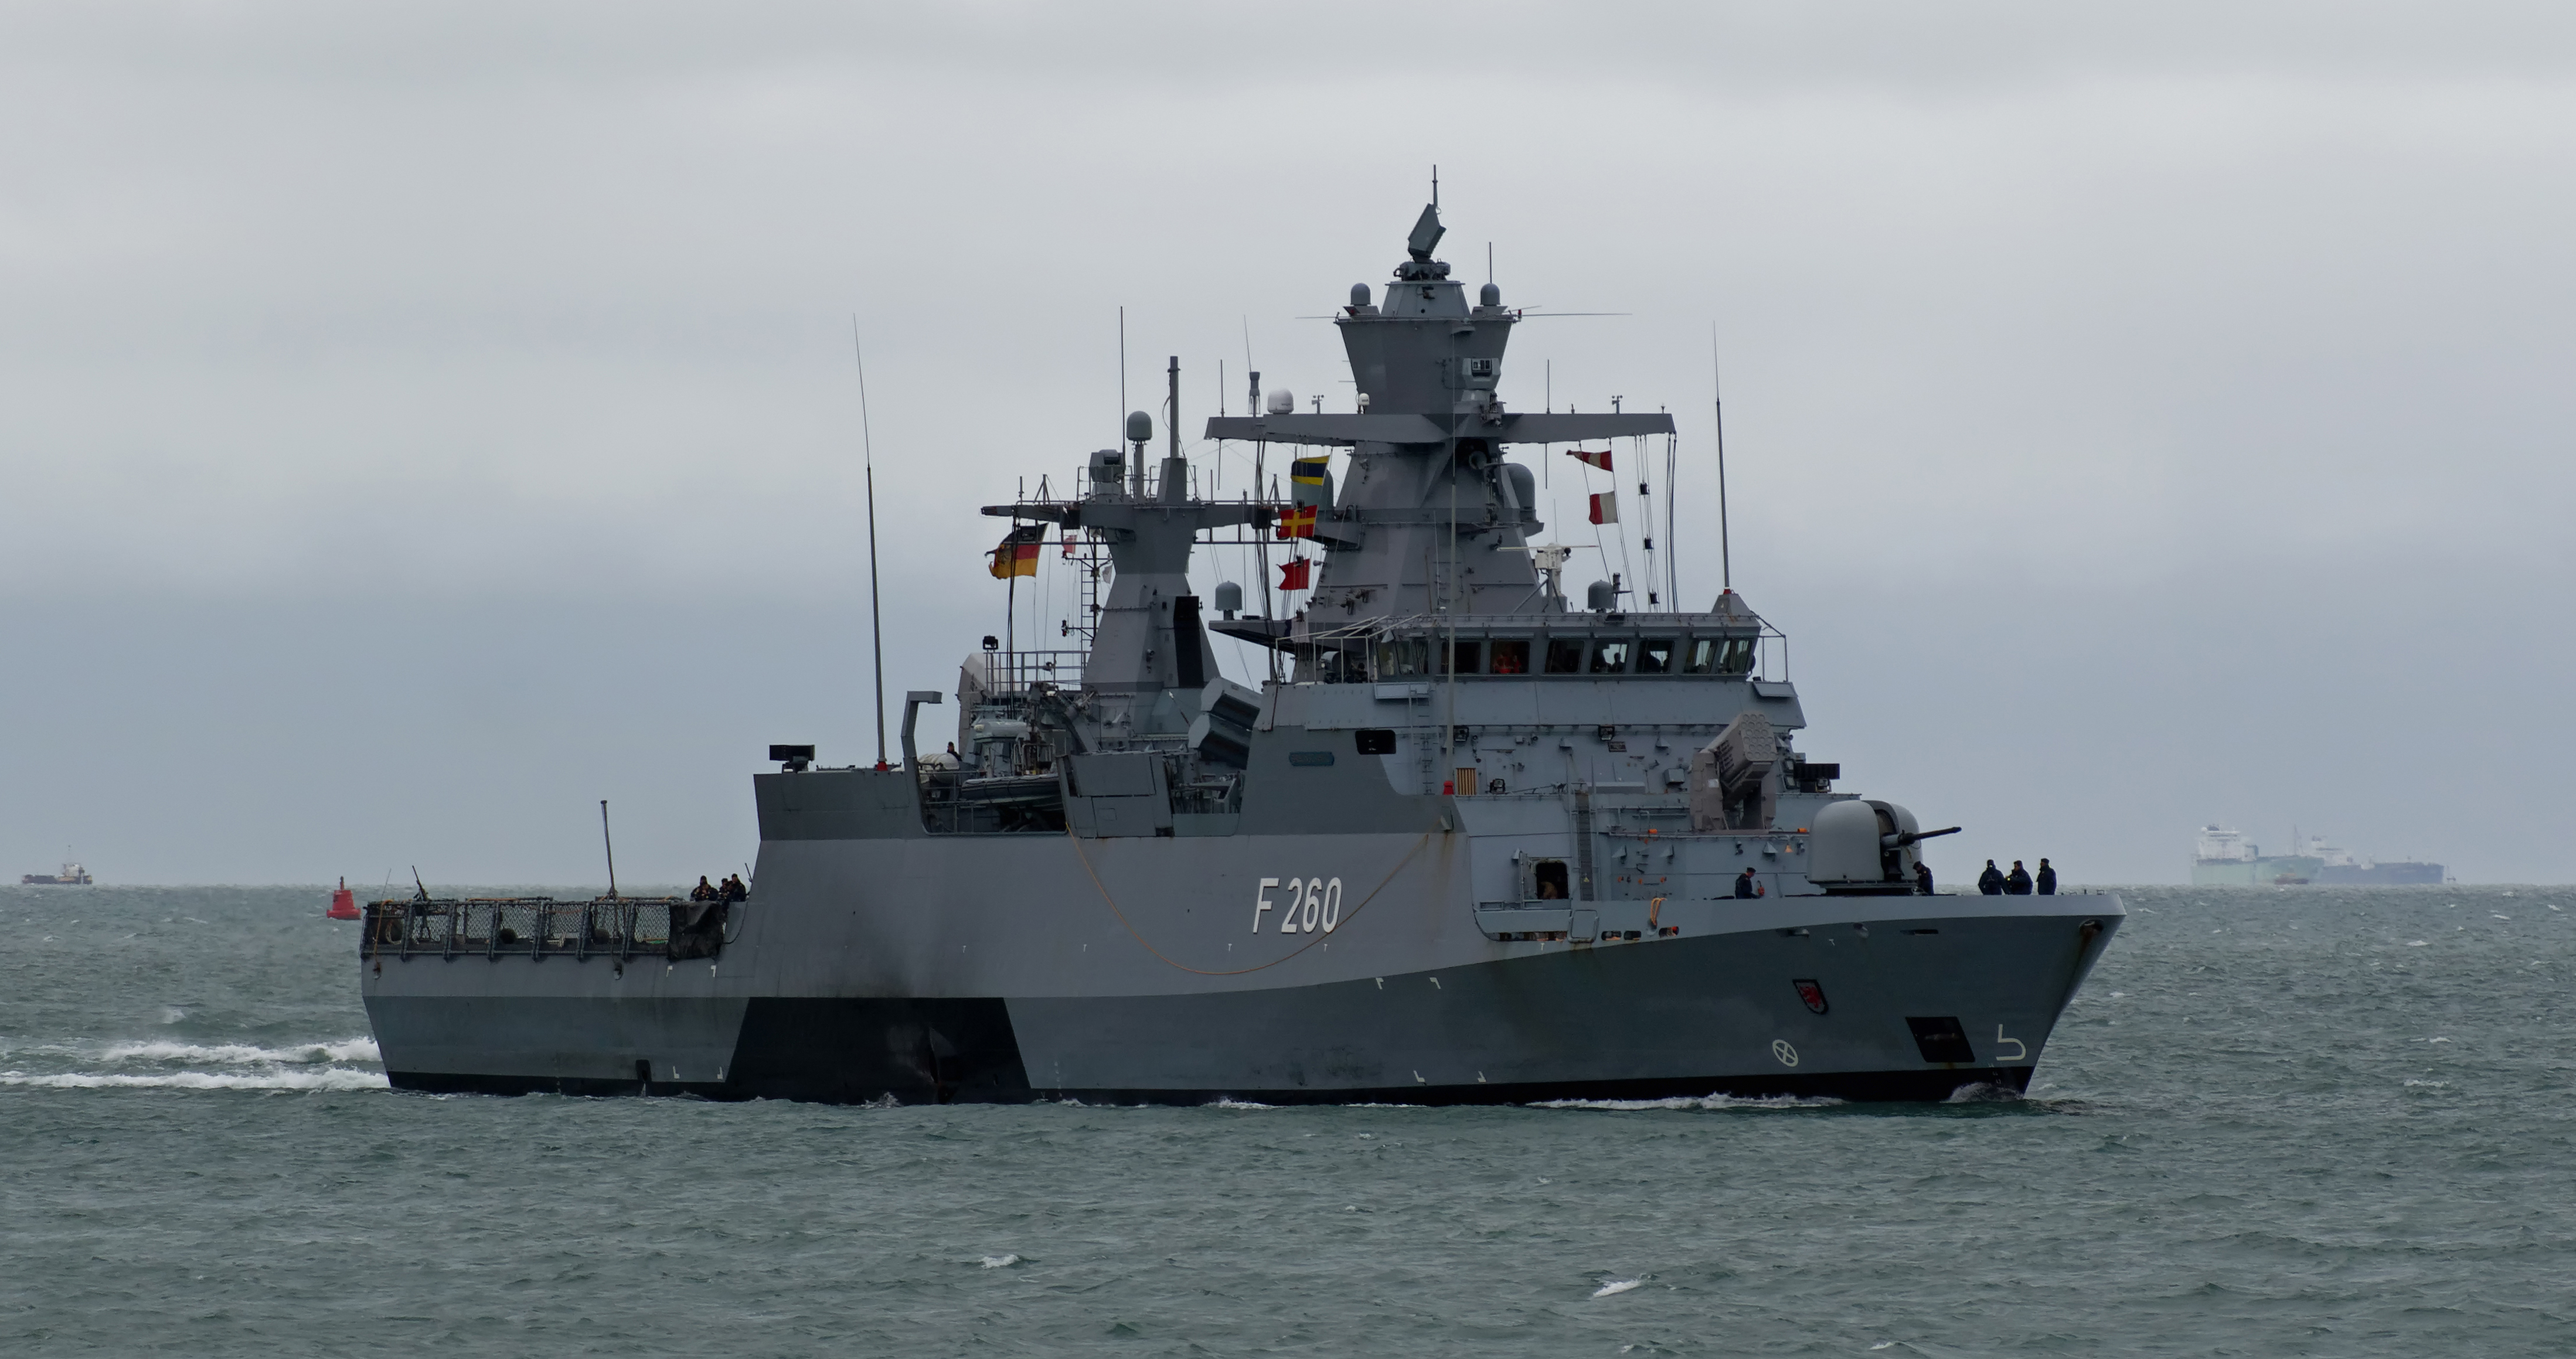 German Navy - Marine Allemande - Page 7 30134846887_4330e36ede_o